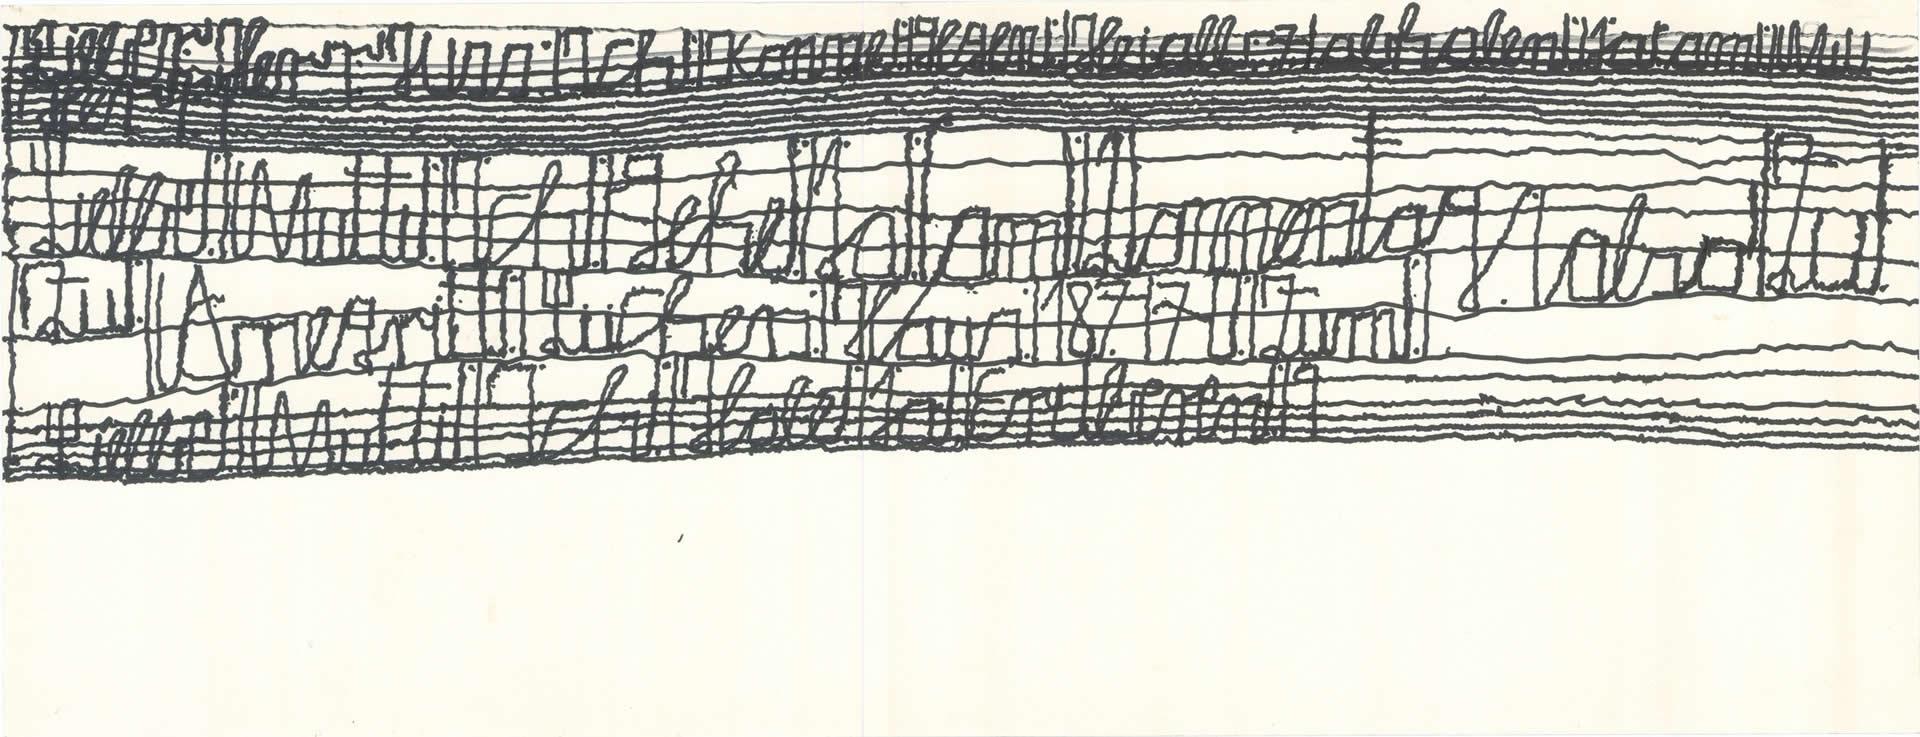 Harald Stoffers | Brief179 2011 | 21x55cm | viennacontemporary | Galerie3